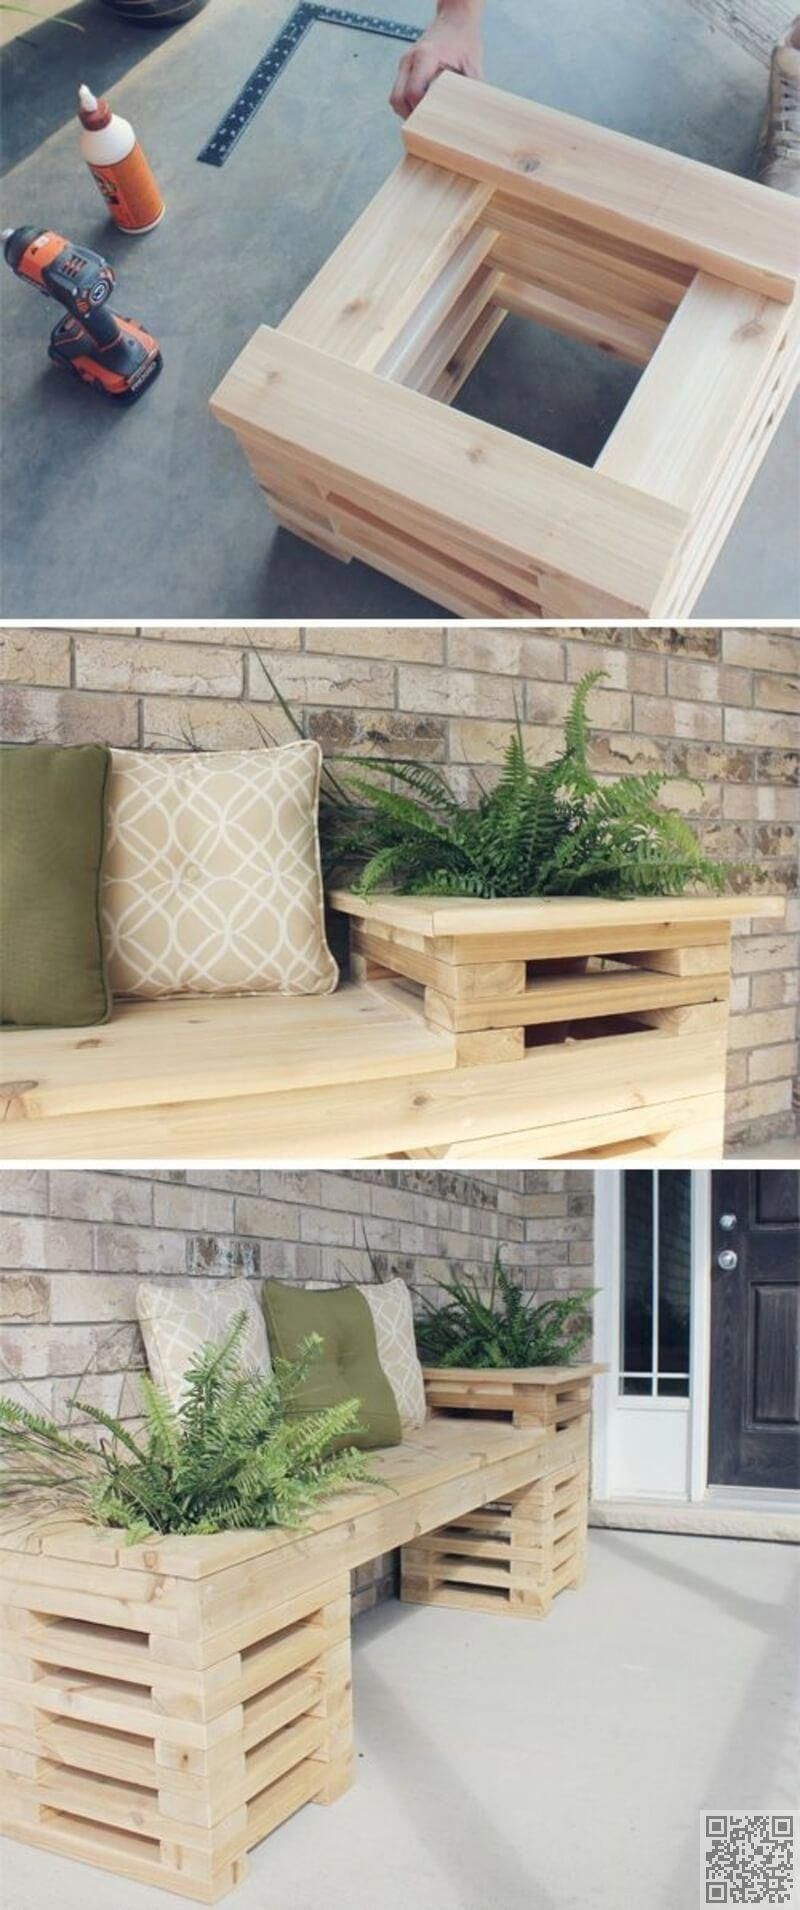 diy wood bench with planters deckdesigns pallet pjt in 2019 diy rh pinterest com